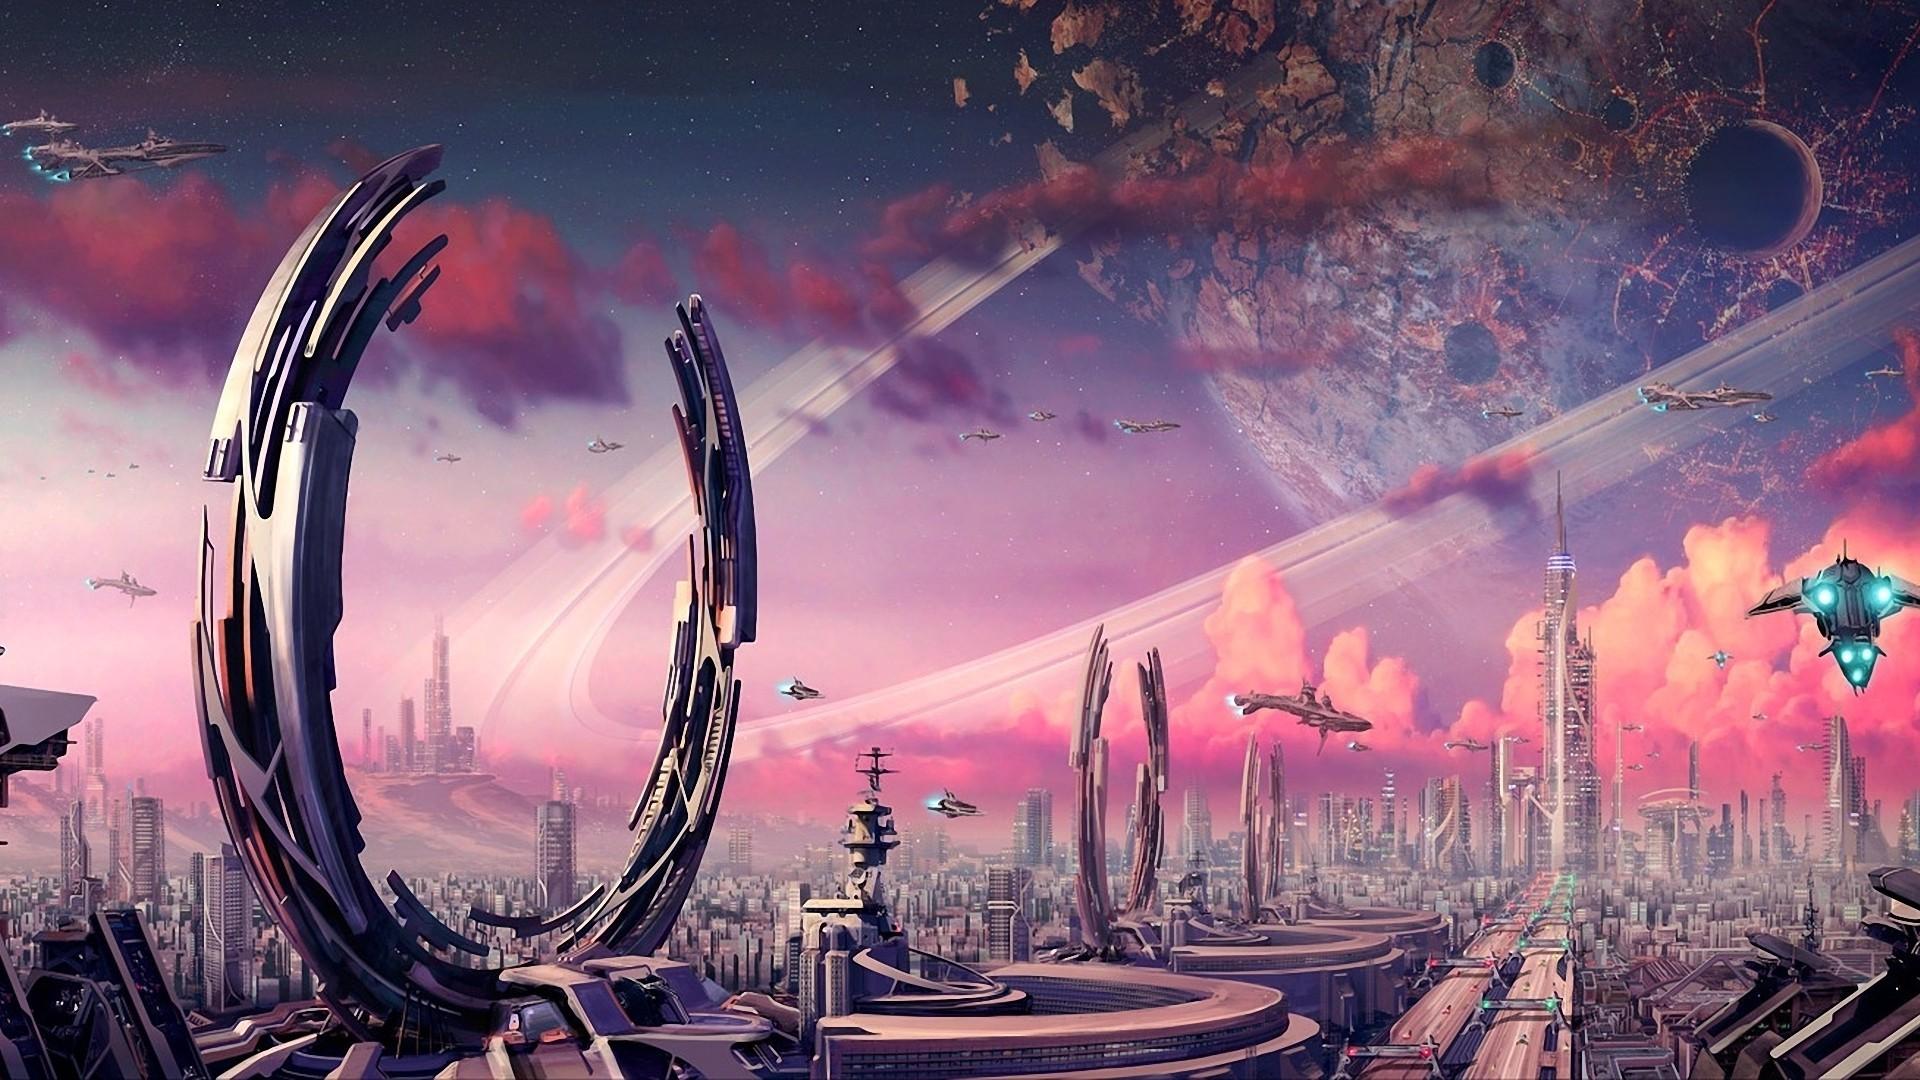 Sci-Fi Wallpaper Dump